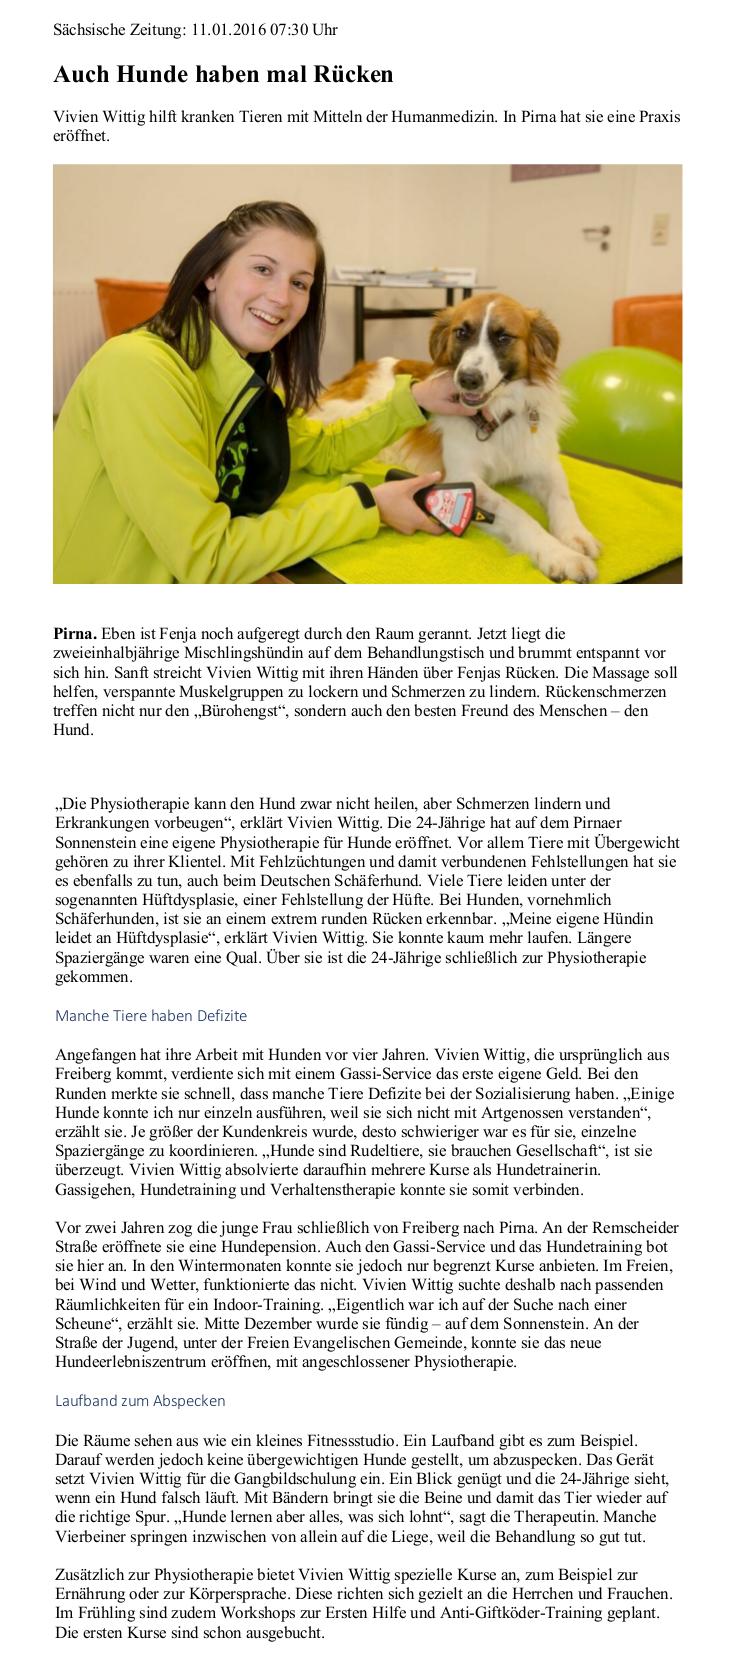 Zauberhunde Feuchtnasen Zeitungsartikel Hundepension Hundephysio Tierheilpraxis